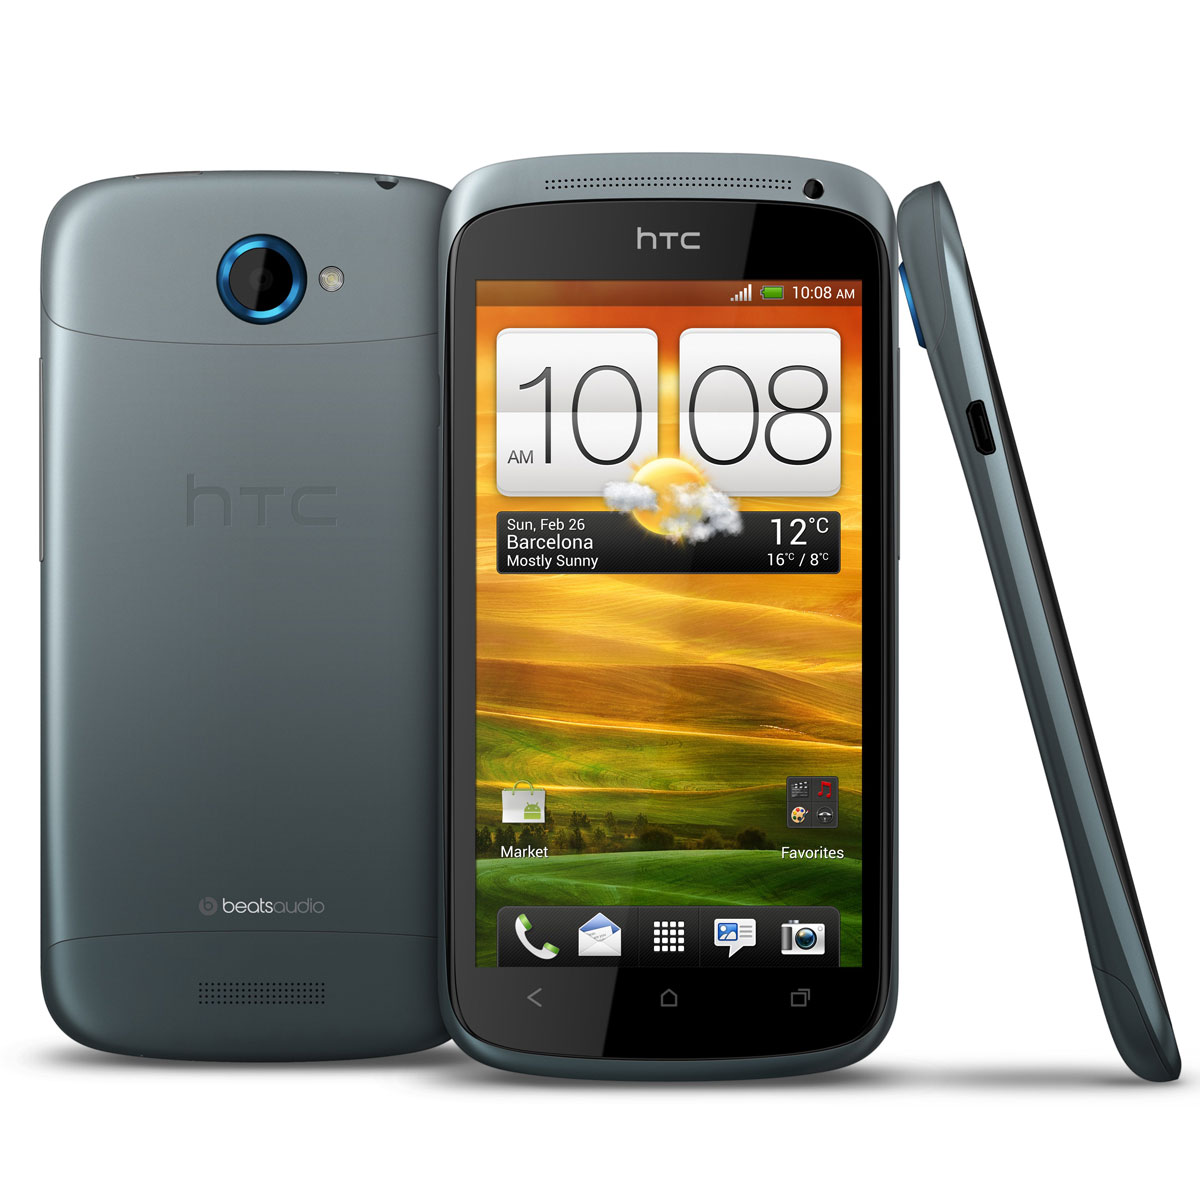 "Mobile & smartphone HTC One S Gris Smartphone 3G+ avec écran tactile 4.3"" sous Android 4.0"